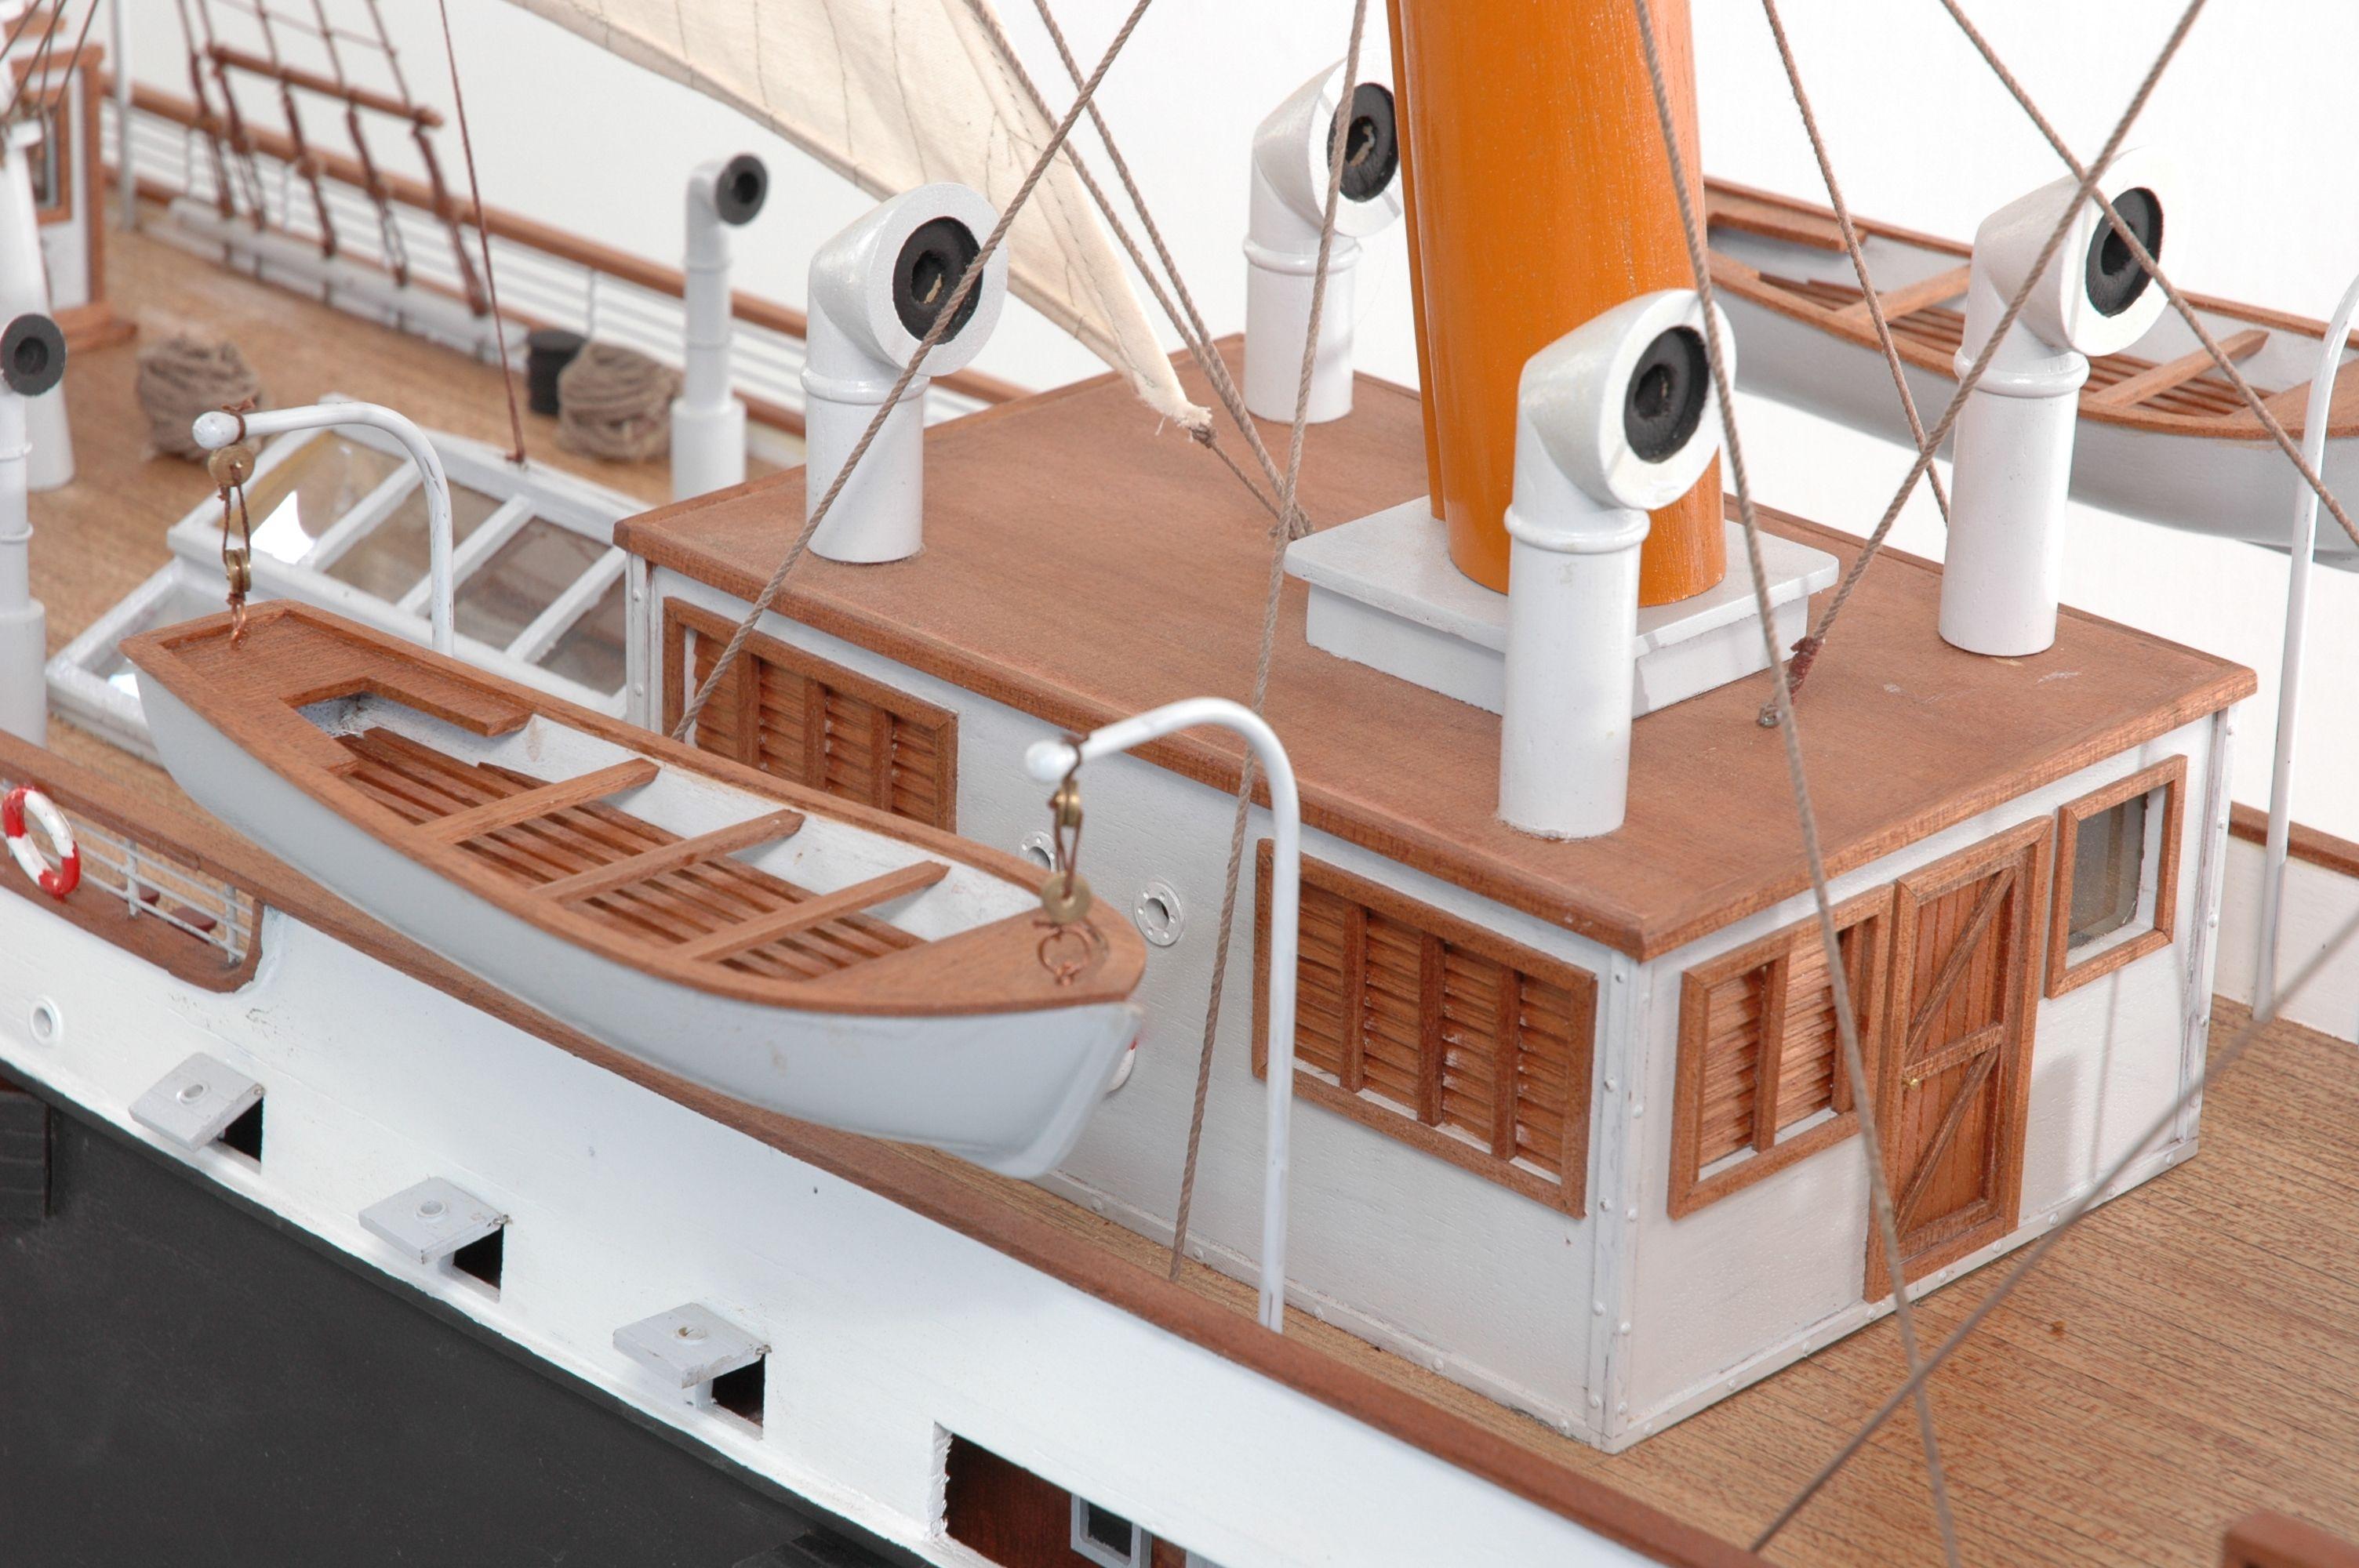 1416-6314-G-G-Loudon-Ship-Model-large-Premier-Range